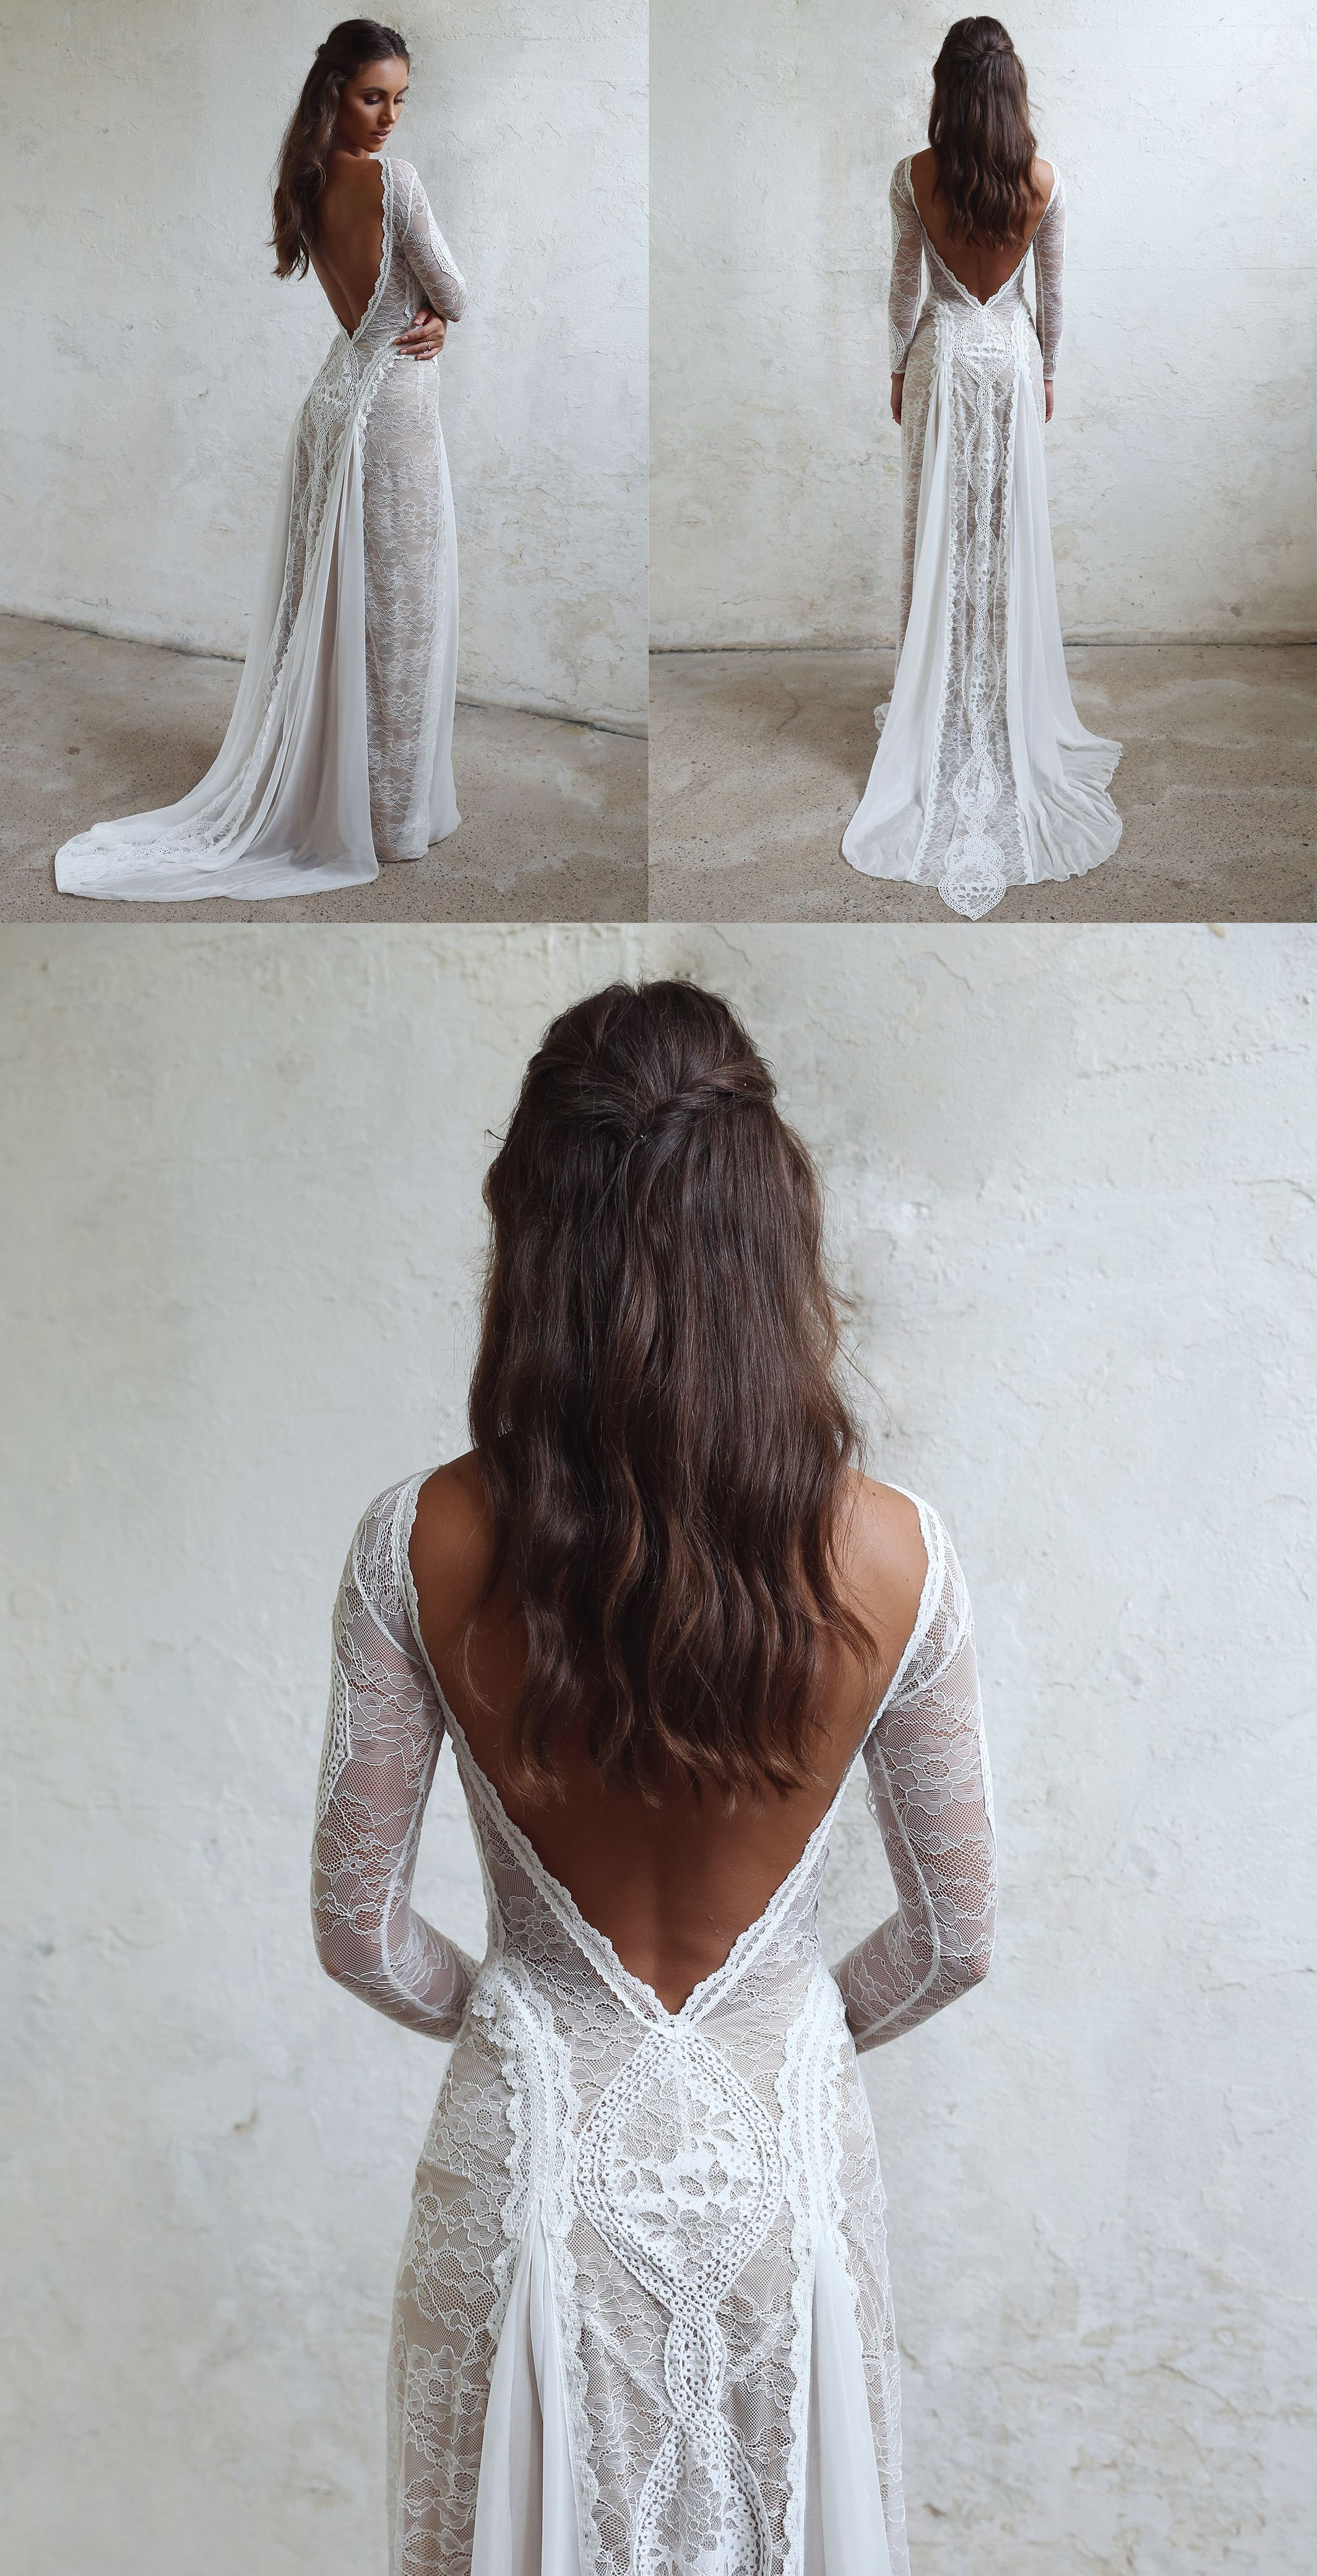 Inca Gown Low Back Wedding Dress Grace Loves Lace Ivory Lace Wedding Dress Wedding Dresses Lace Beach Wedding Dress